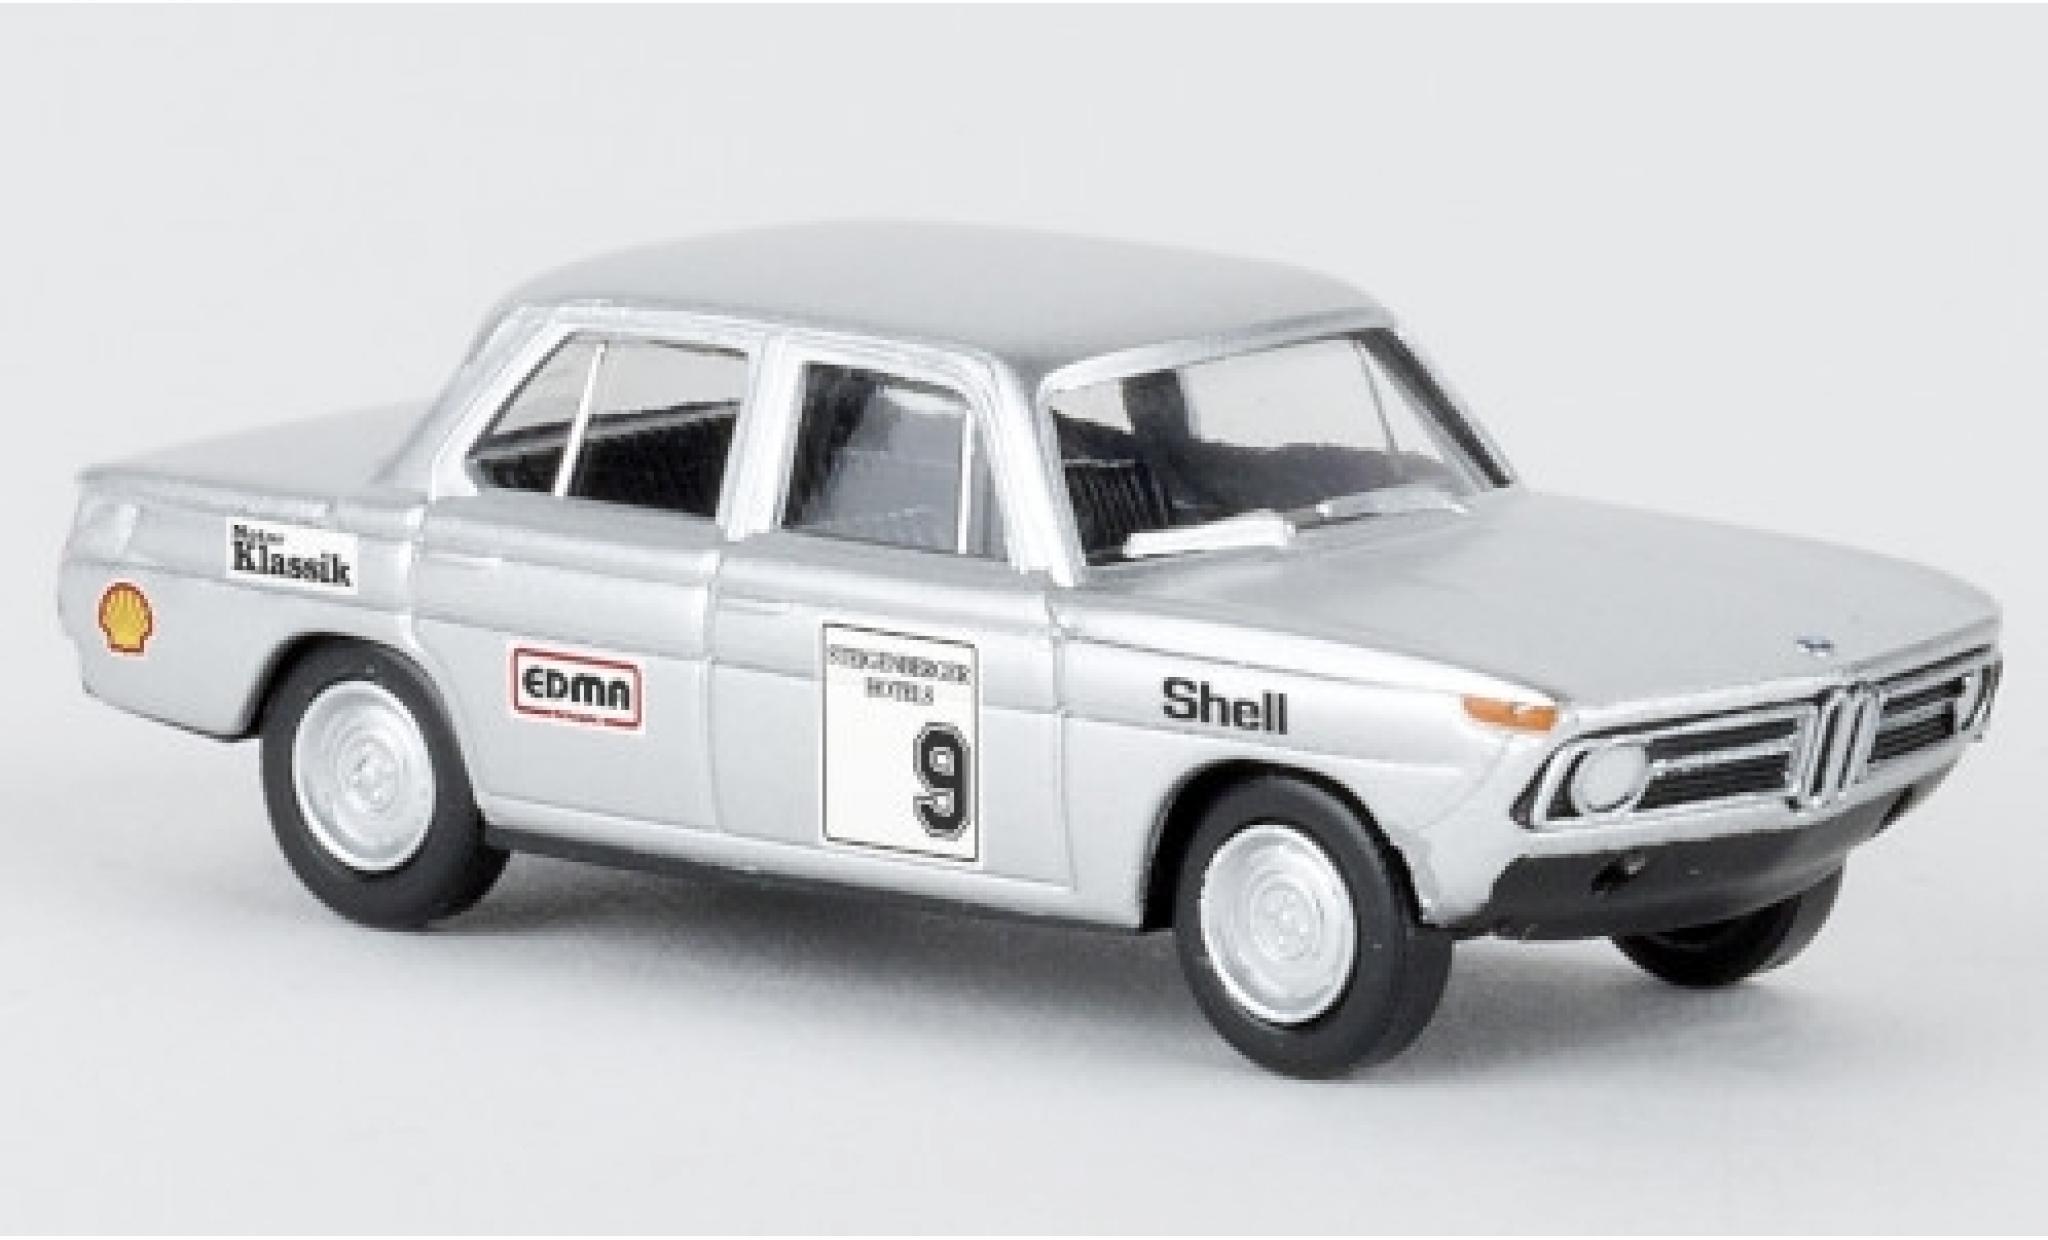 Bmw 1800 1/87 Brekina tii Oldtimer Grand Prix 1985